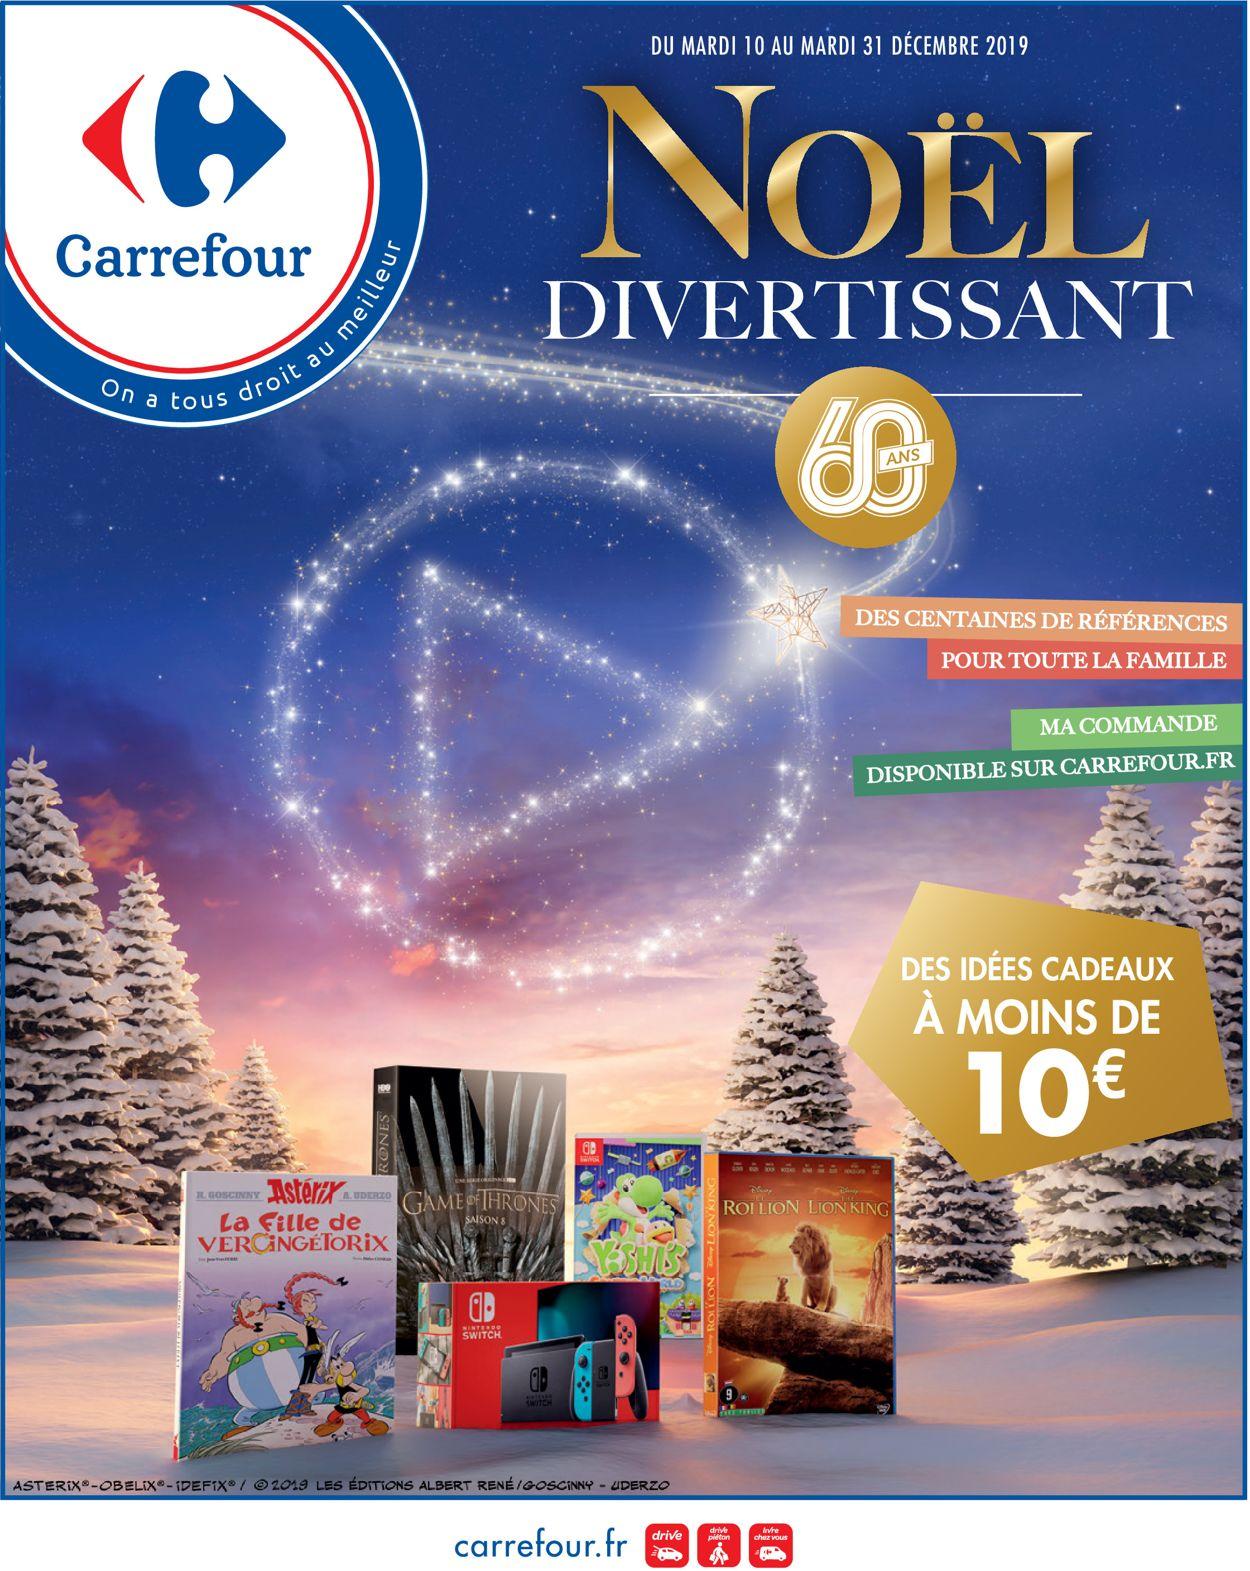 Carrefour - catalogue de Noël 2019 Catalogue - 10.12-31.12.2019